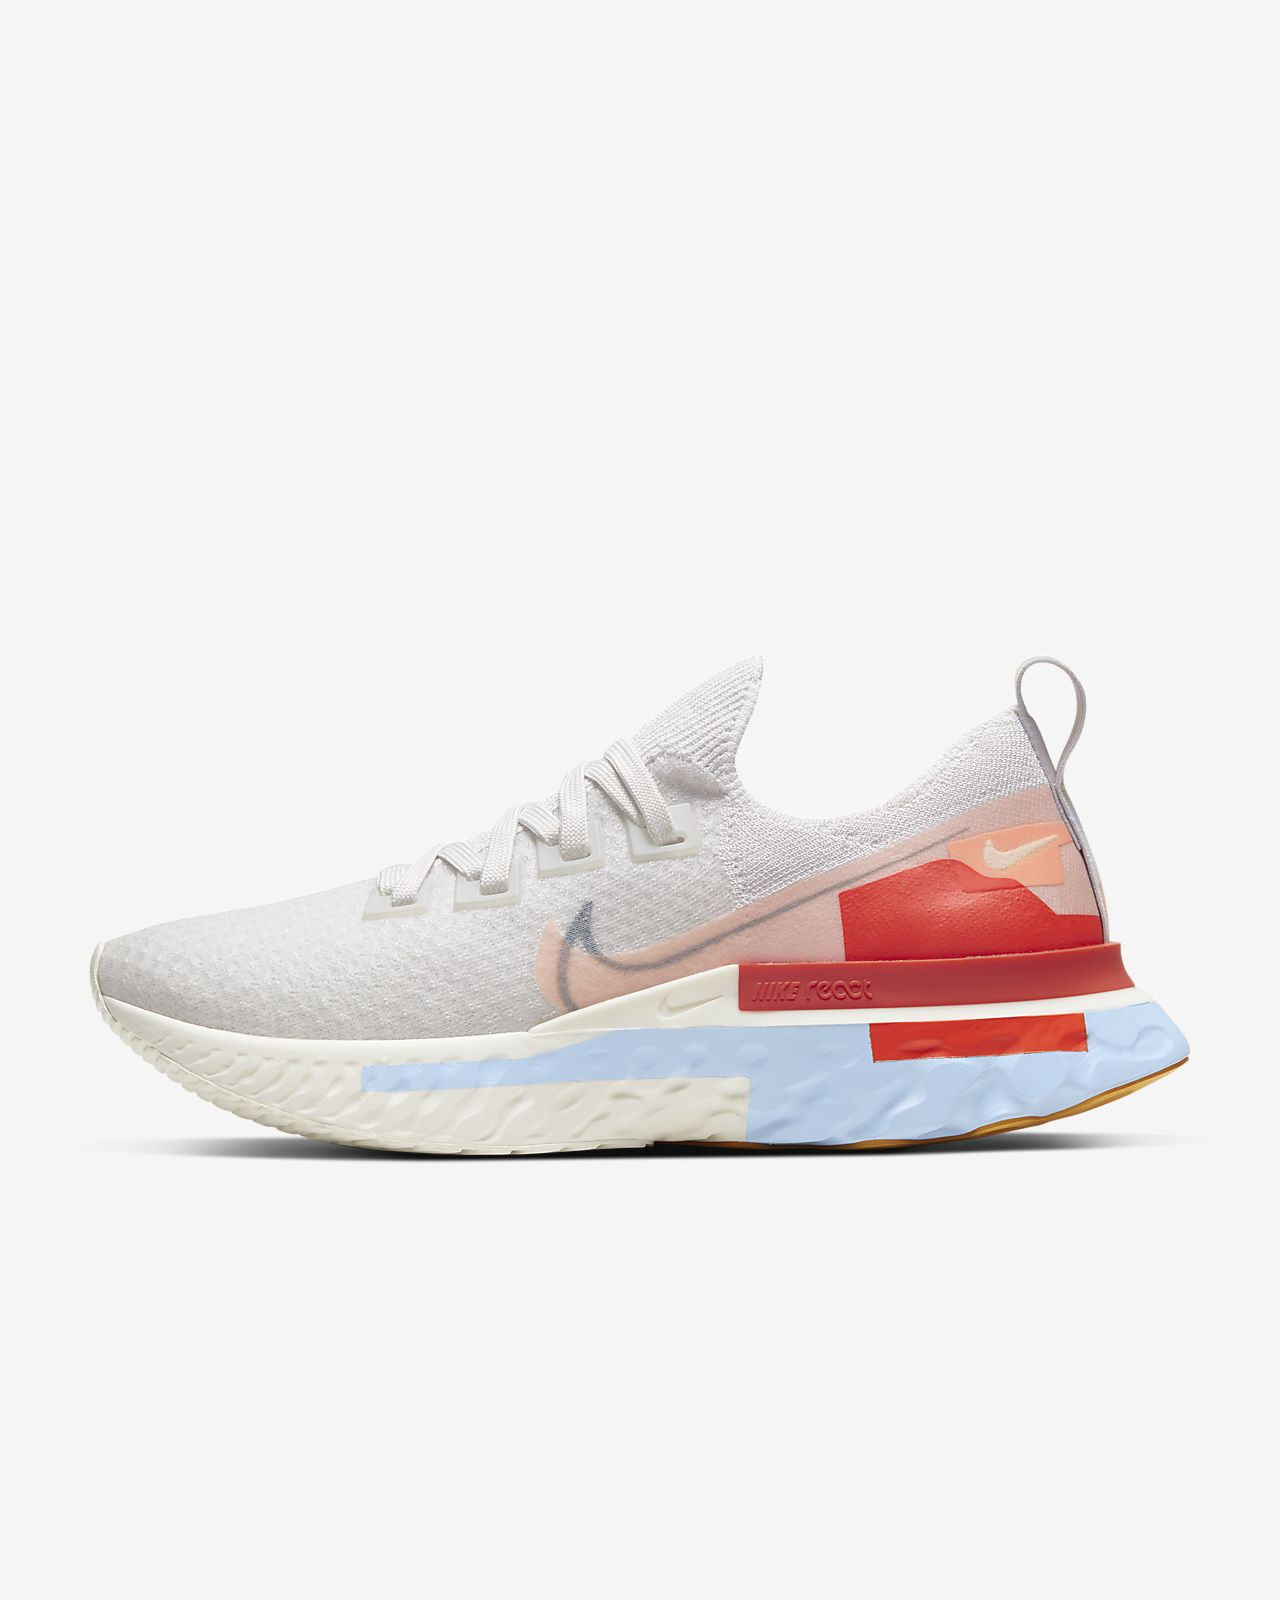 Calzado de running para mujer Nike React Infinity Run Flyknit Premium